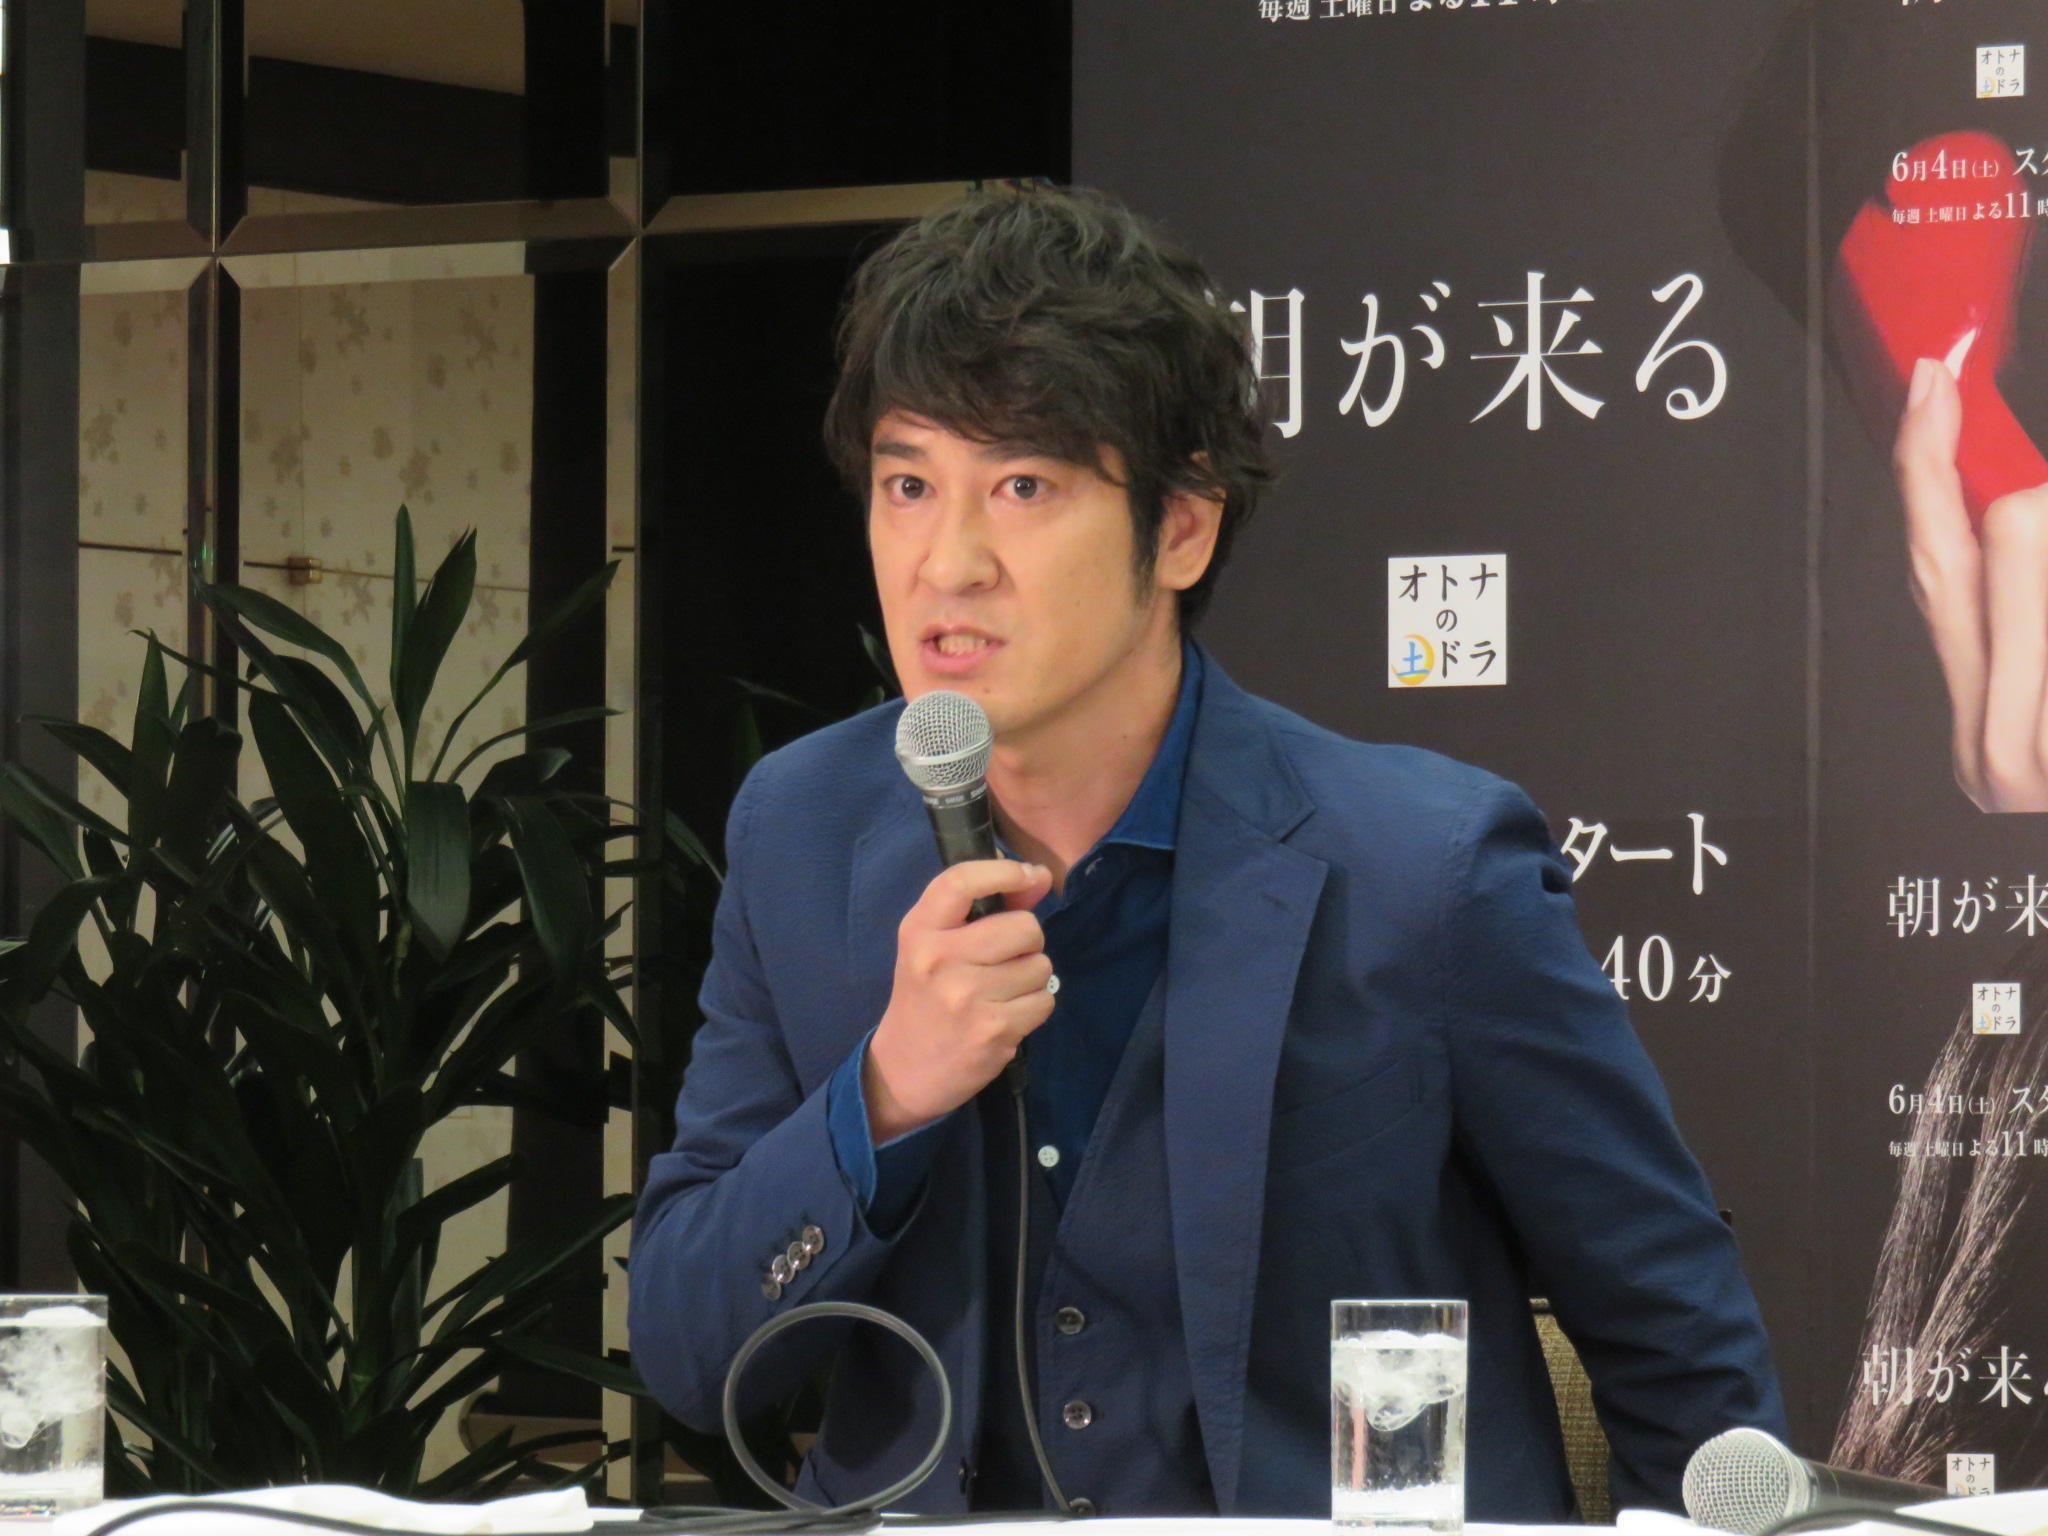 http://news.yoshimoto.co.jp/20160531153448-5fb2eb0d663da86fd3fc2cd098f2c566db746f50.jpg